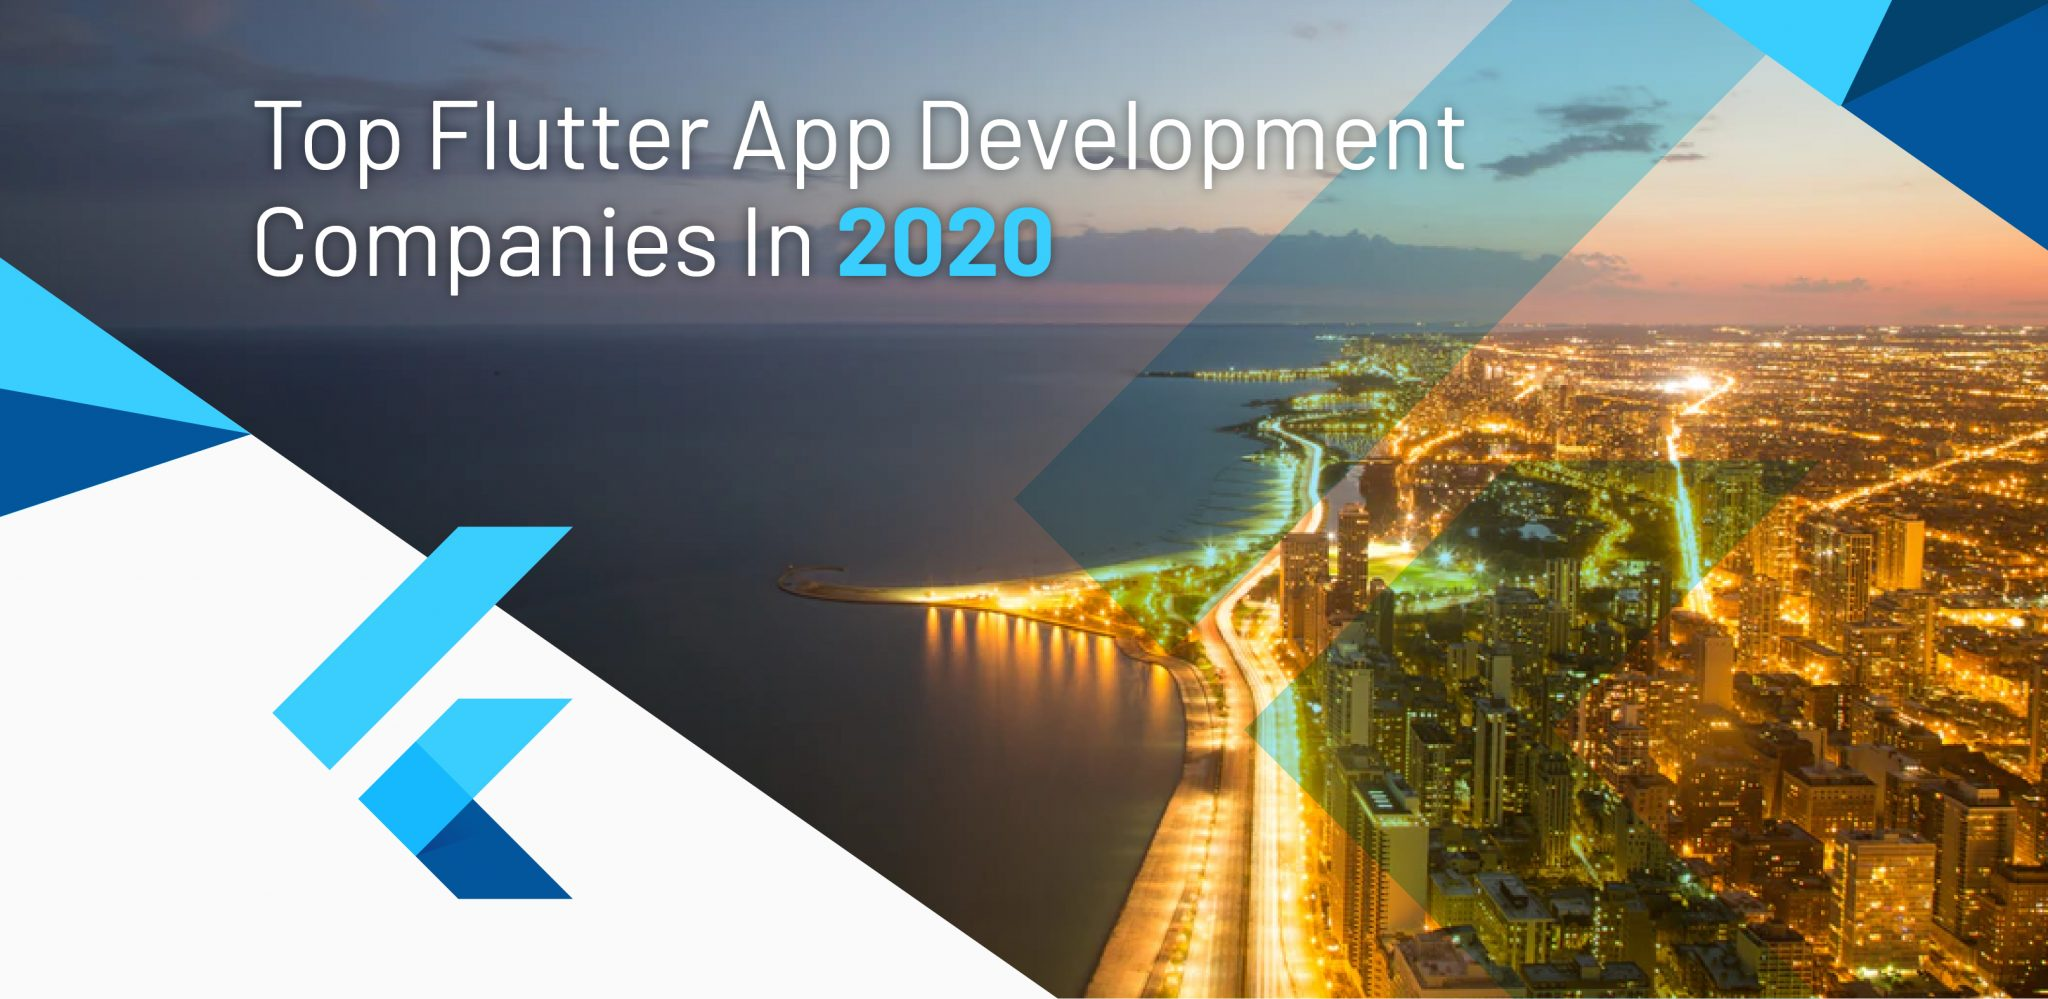 Top Flutter App Development Companies in 2020 - WebClues Infotech